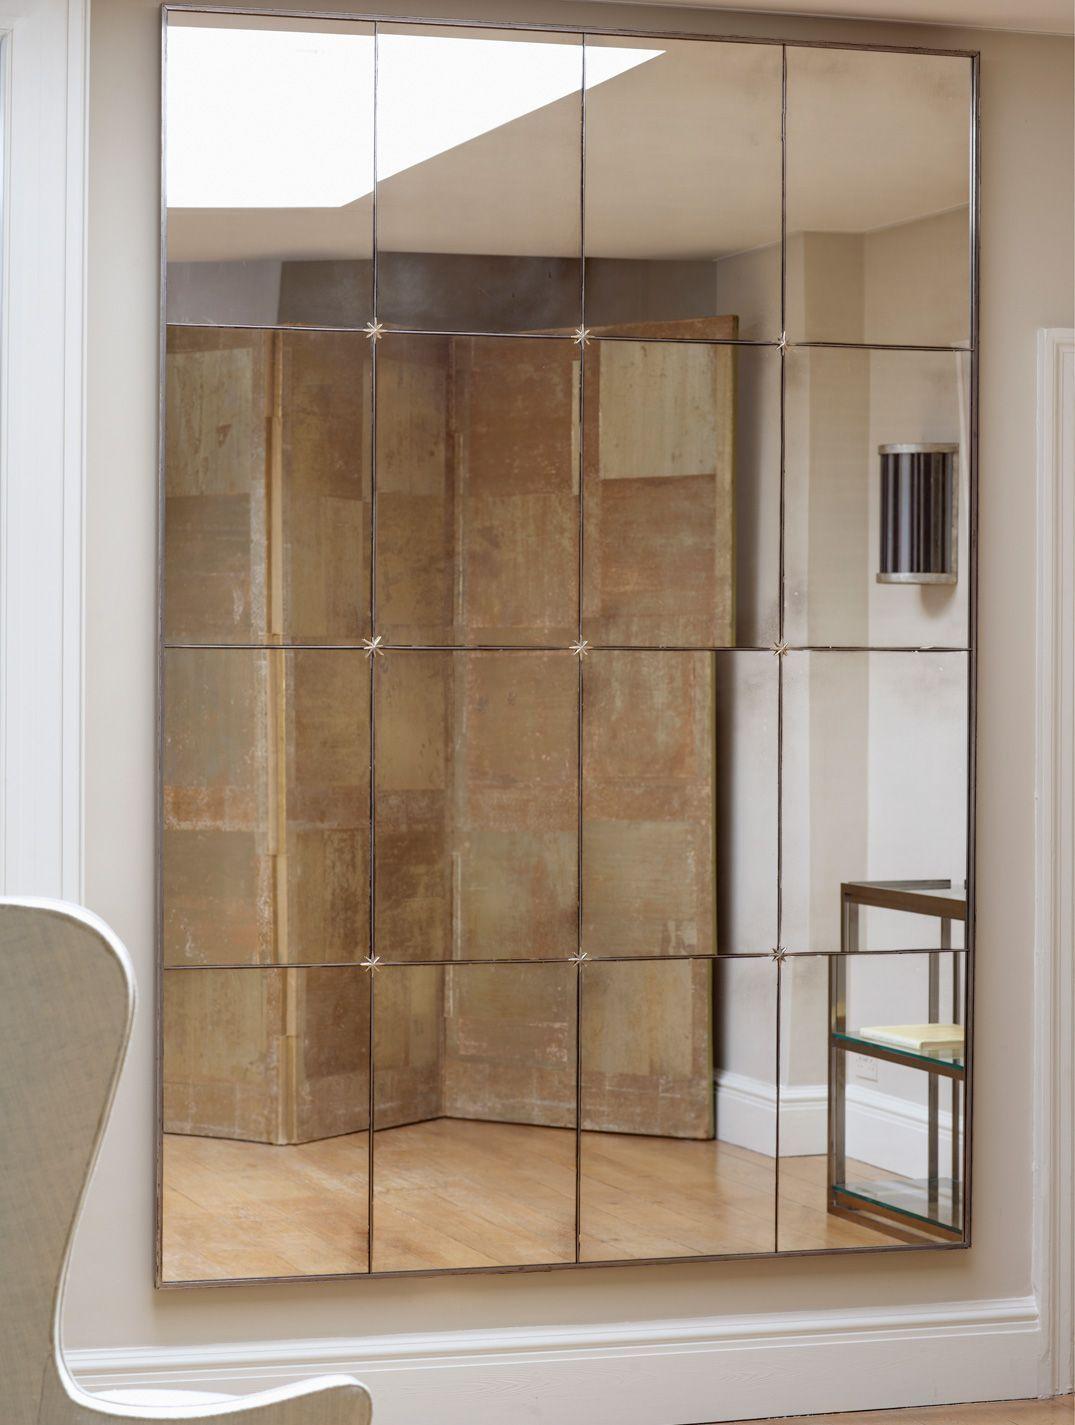 6 Astonishing Diy Ideas: Wall Mirror Interior Texture ...